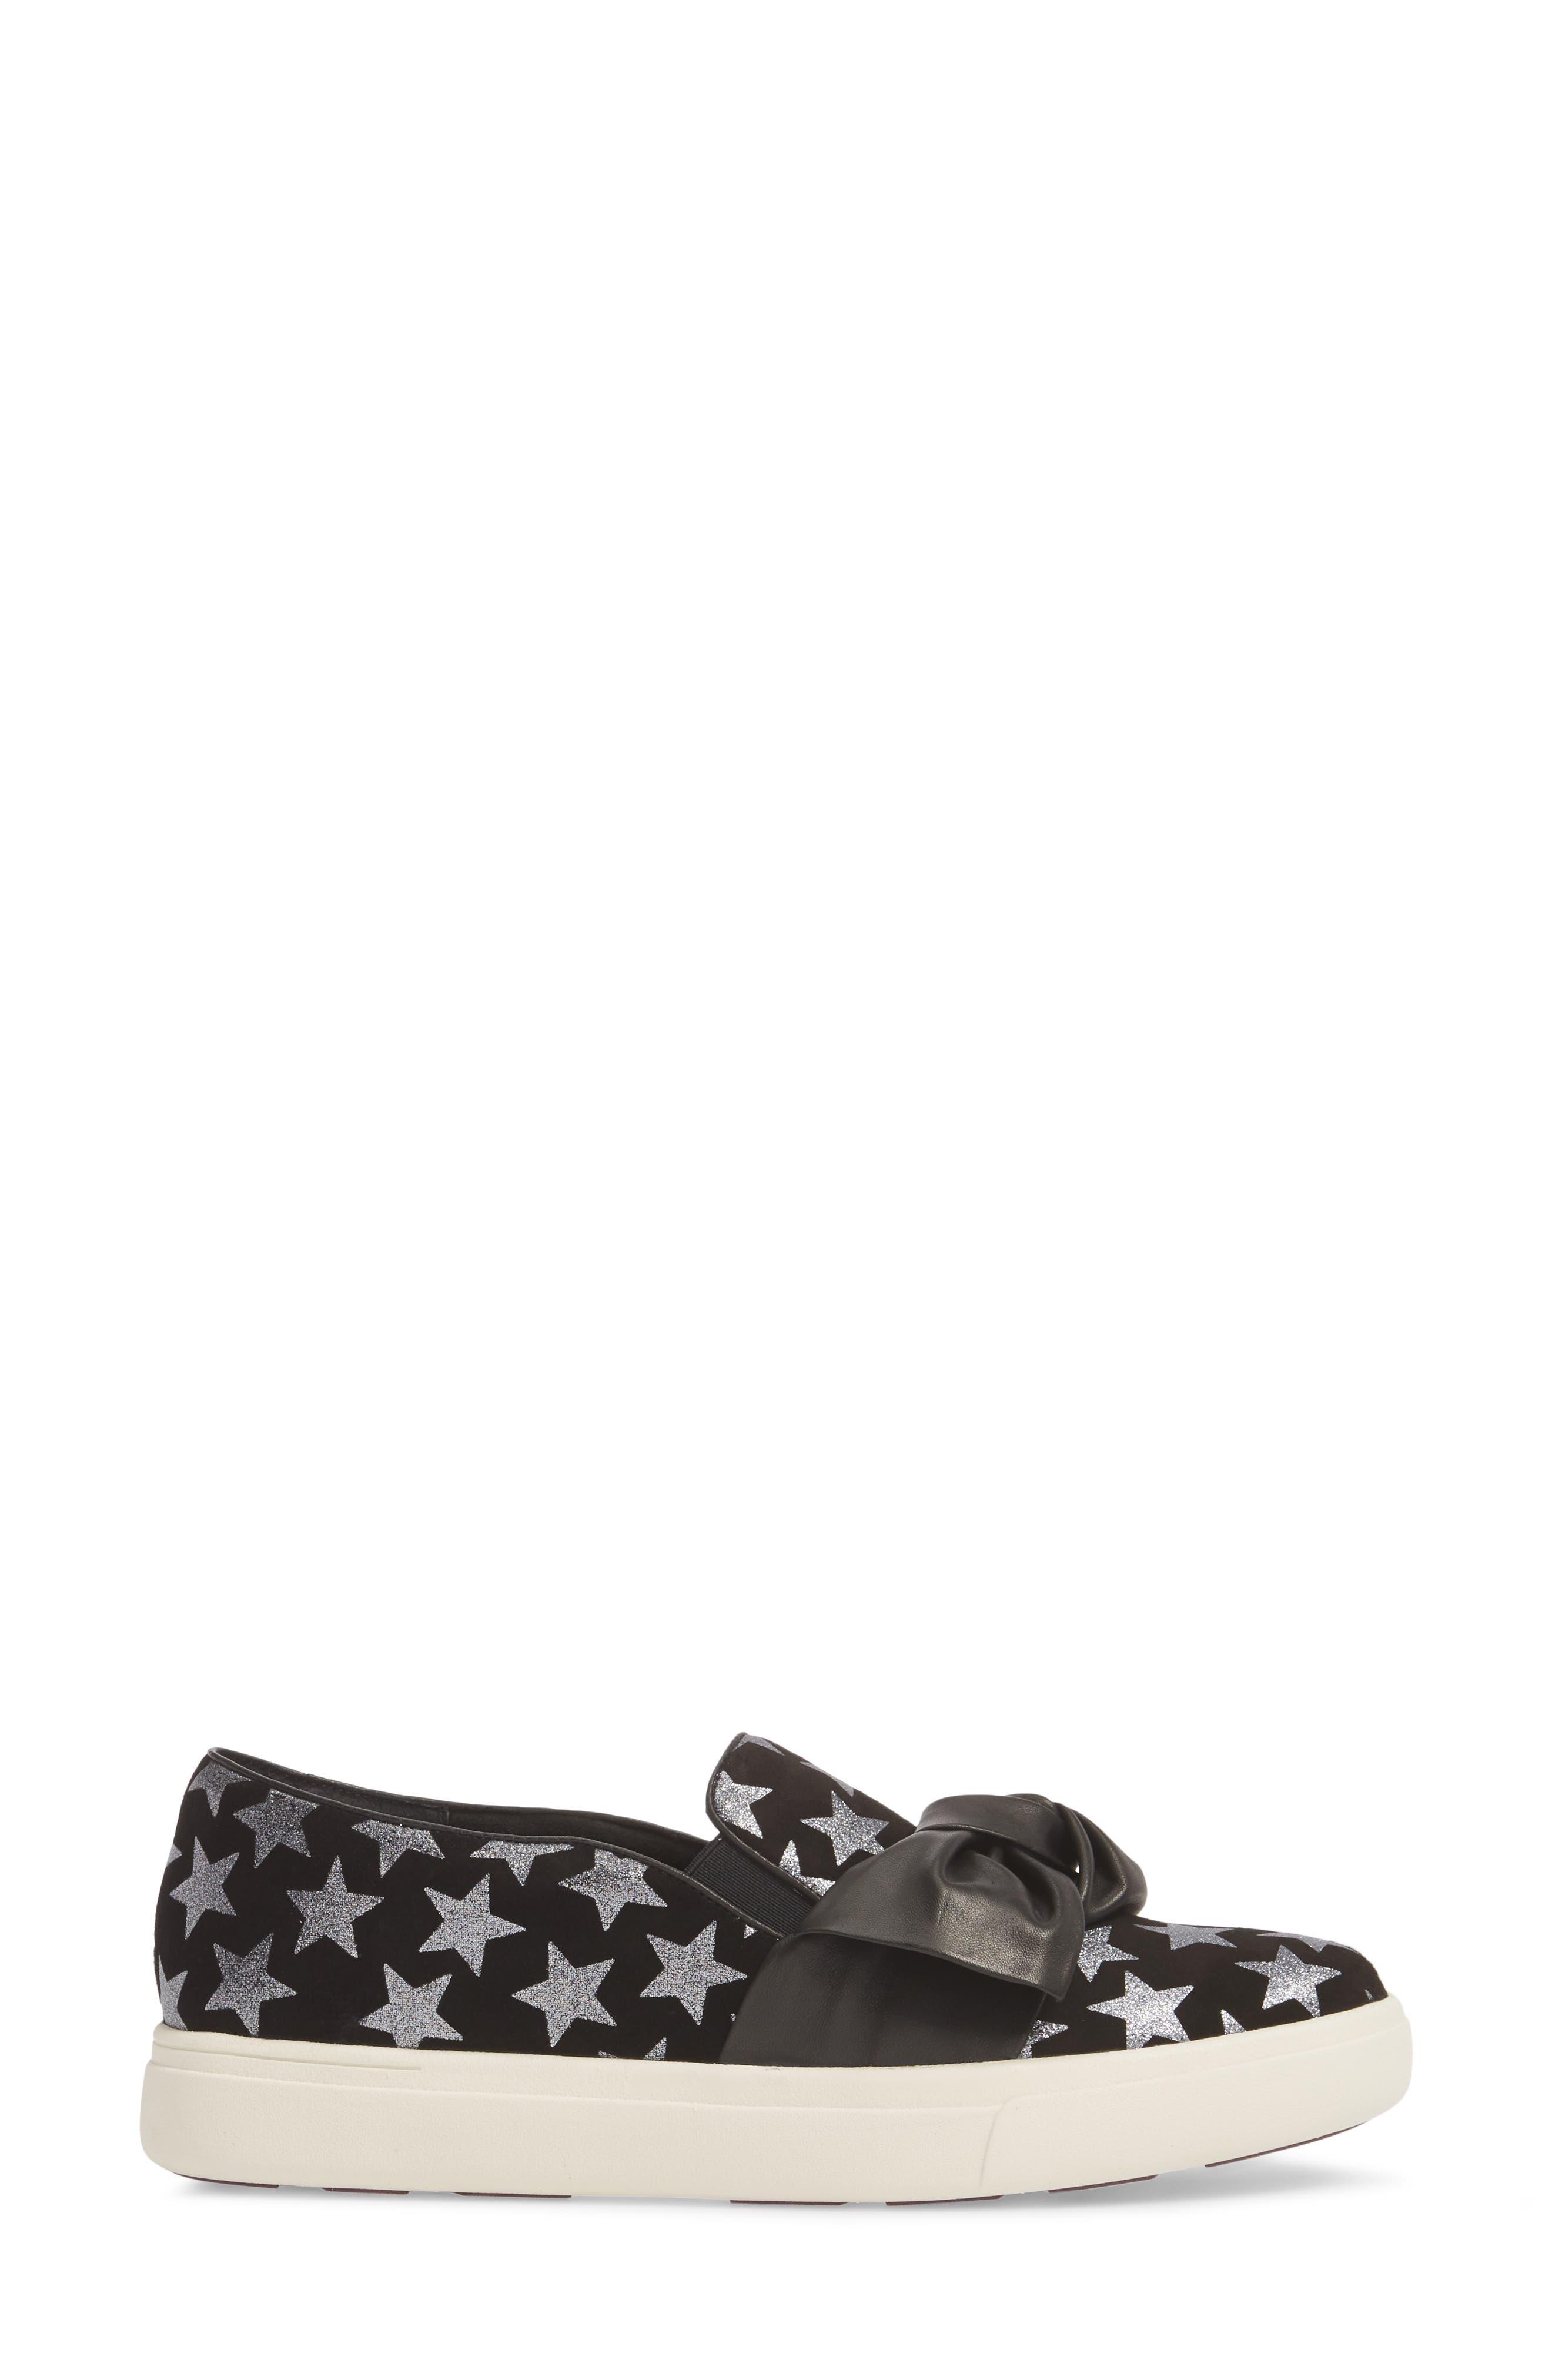 VANELI,                             Odelet Slip-On Sneaker,                             Alternate thumbnail 3, color,                             BLACK/ PEWTER SUEDE